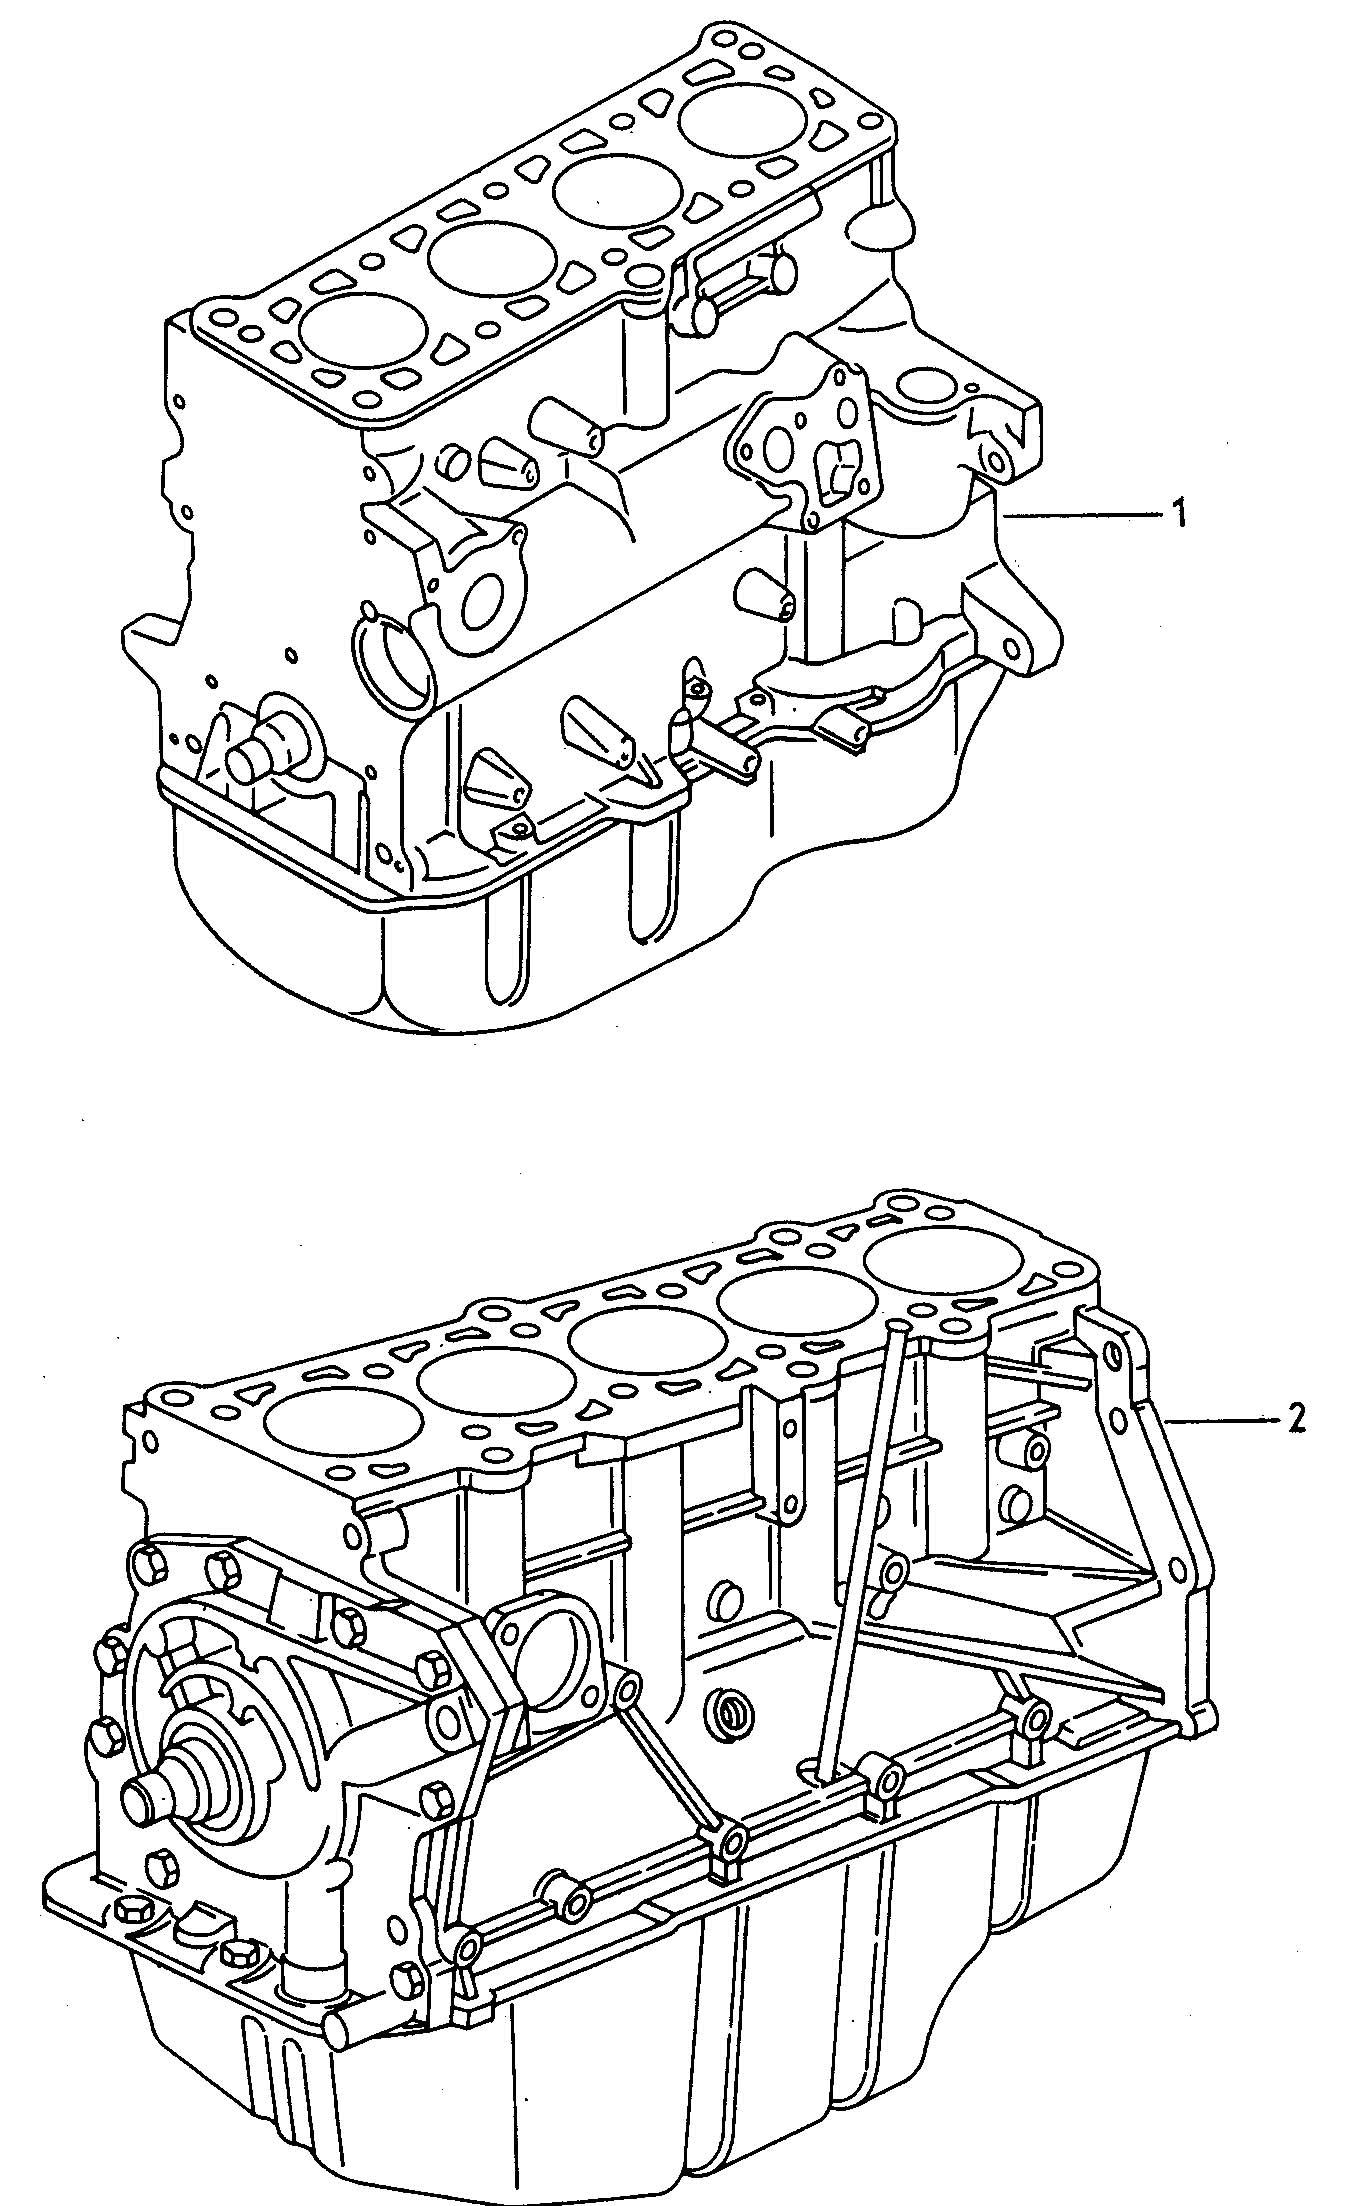 1998 Volkswagen (VW) Golf Base engine without distribu